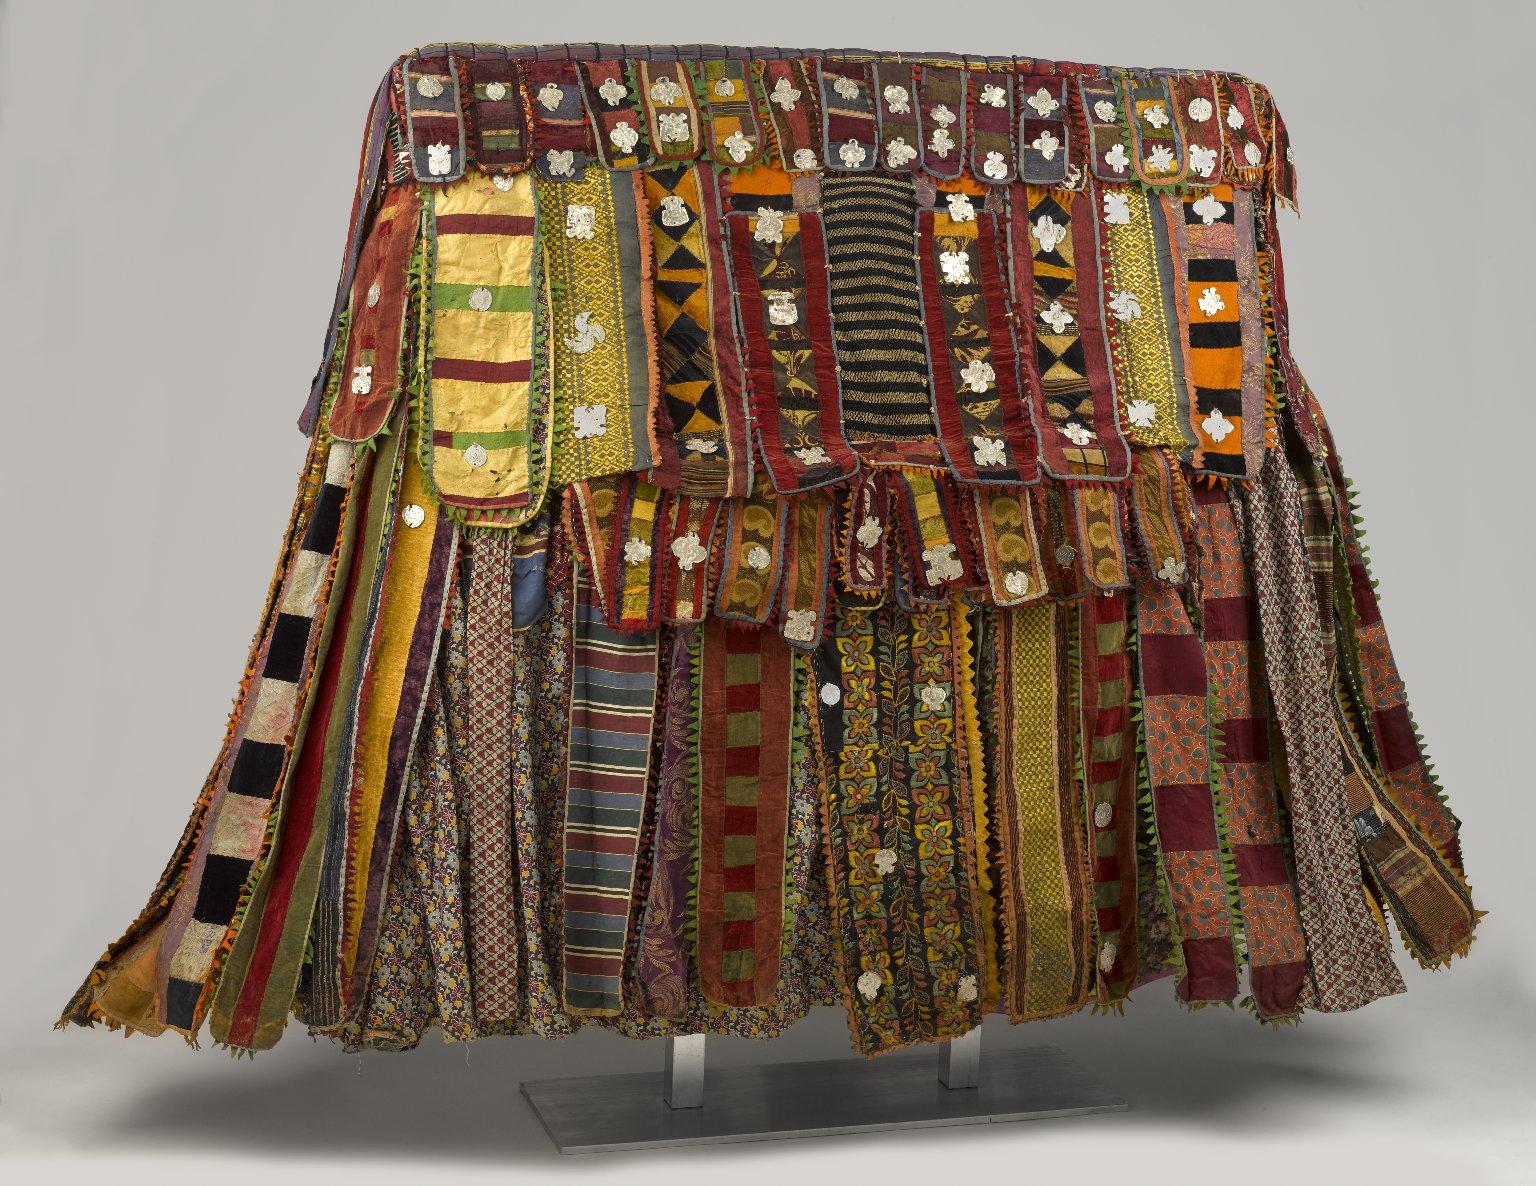 "Brooklyn Museum, ""Yoruba Egungun Dance Costume,"" Digital image,Wikimedia,Accessed January 31, 2017.  https://commons.wikimedia.org/wiki/File:Yoruba_Egungun_Dance_Costume_Brooklyn_Museum.jpg#metadata ."